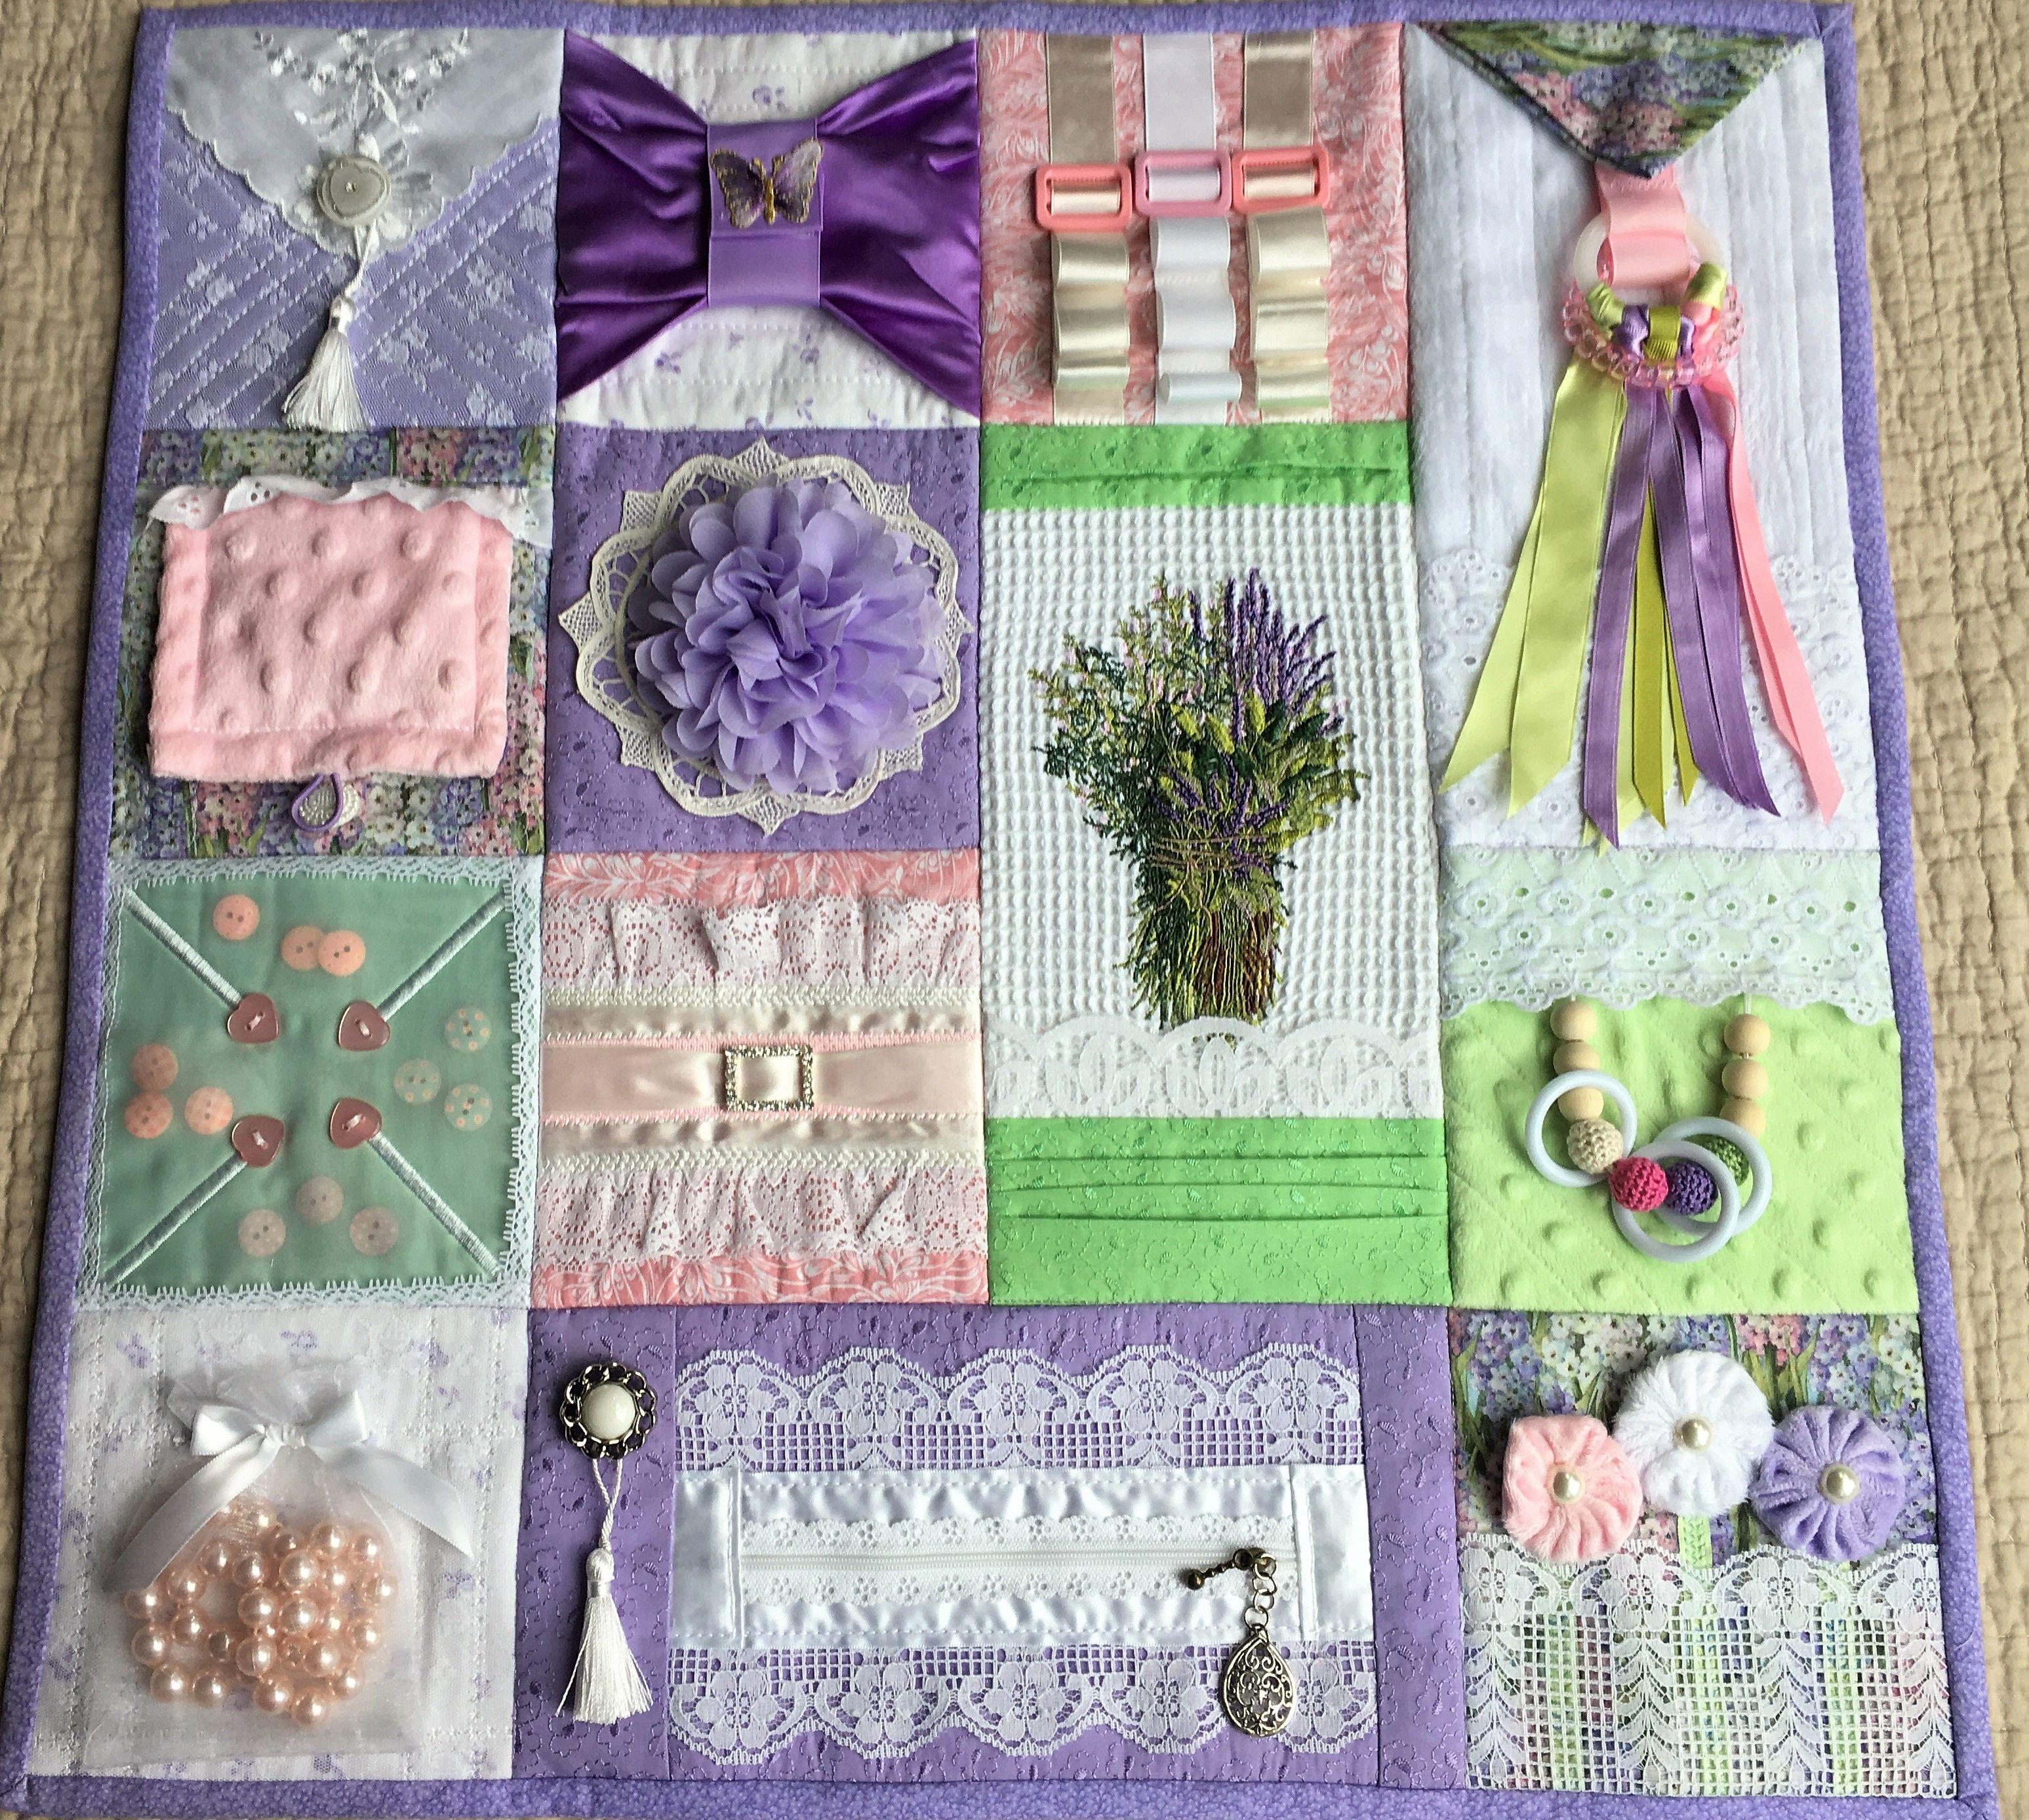 Quilting Slider Mat: Lavender & Lace Fidget Quilt. Activities: Pearl Necklace